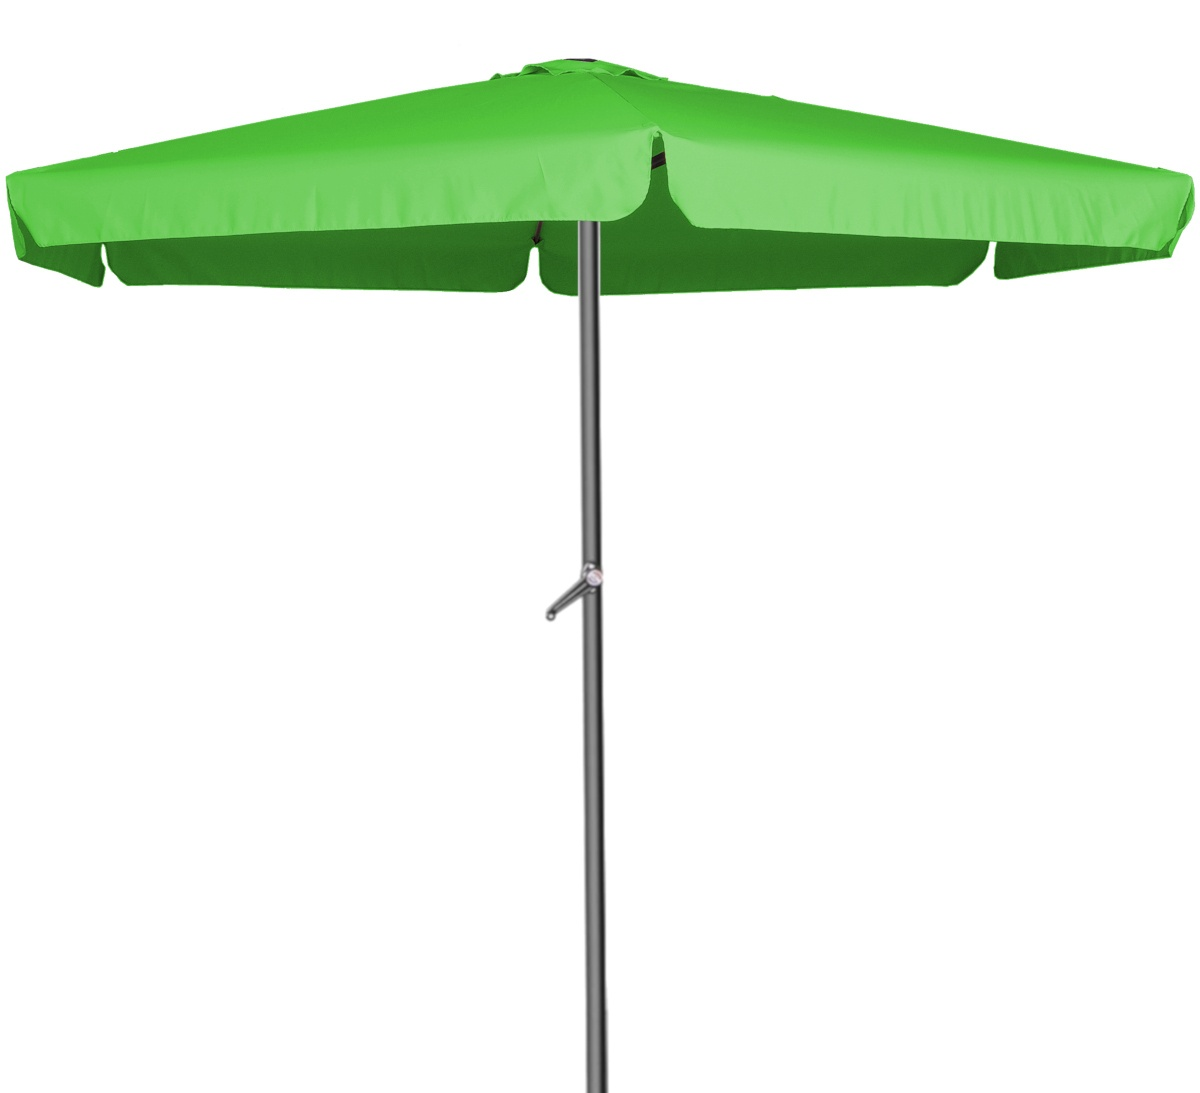 Linder Exclusiv Slunečník MC2012LG 400 cm Lime Green